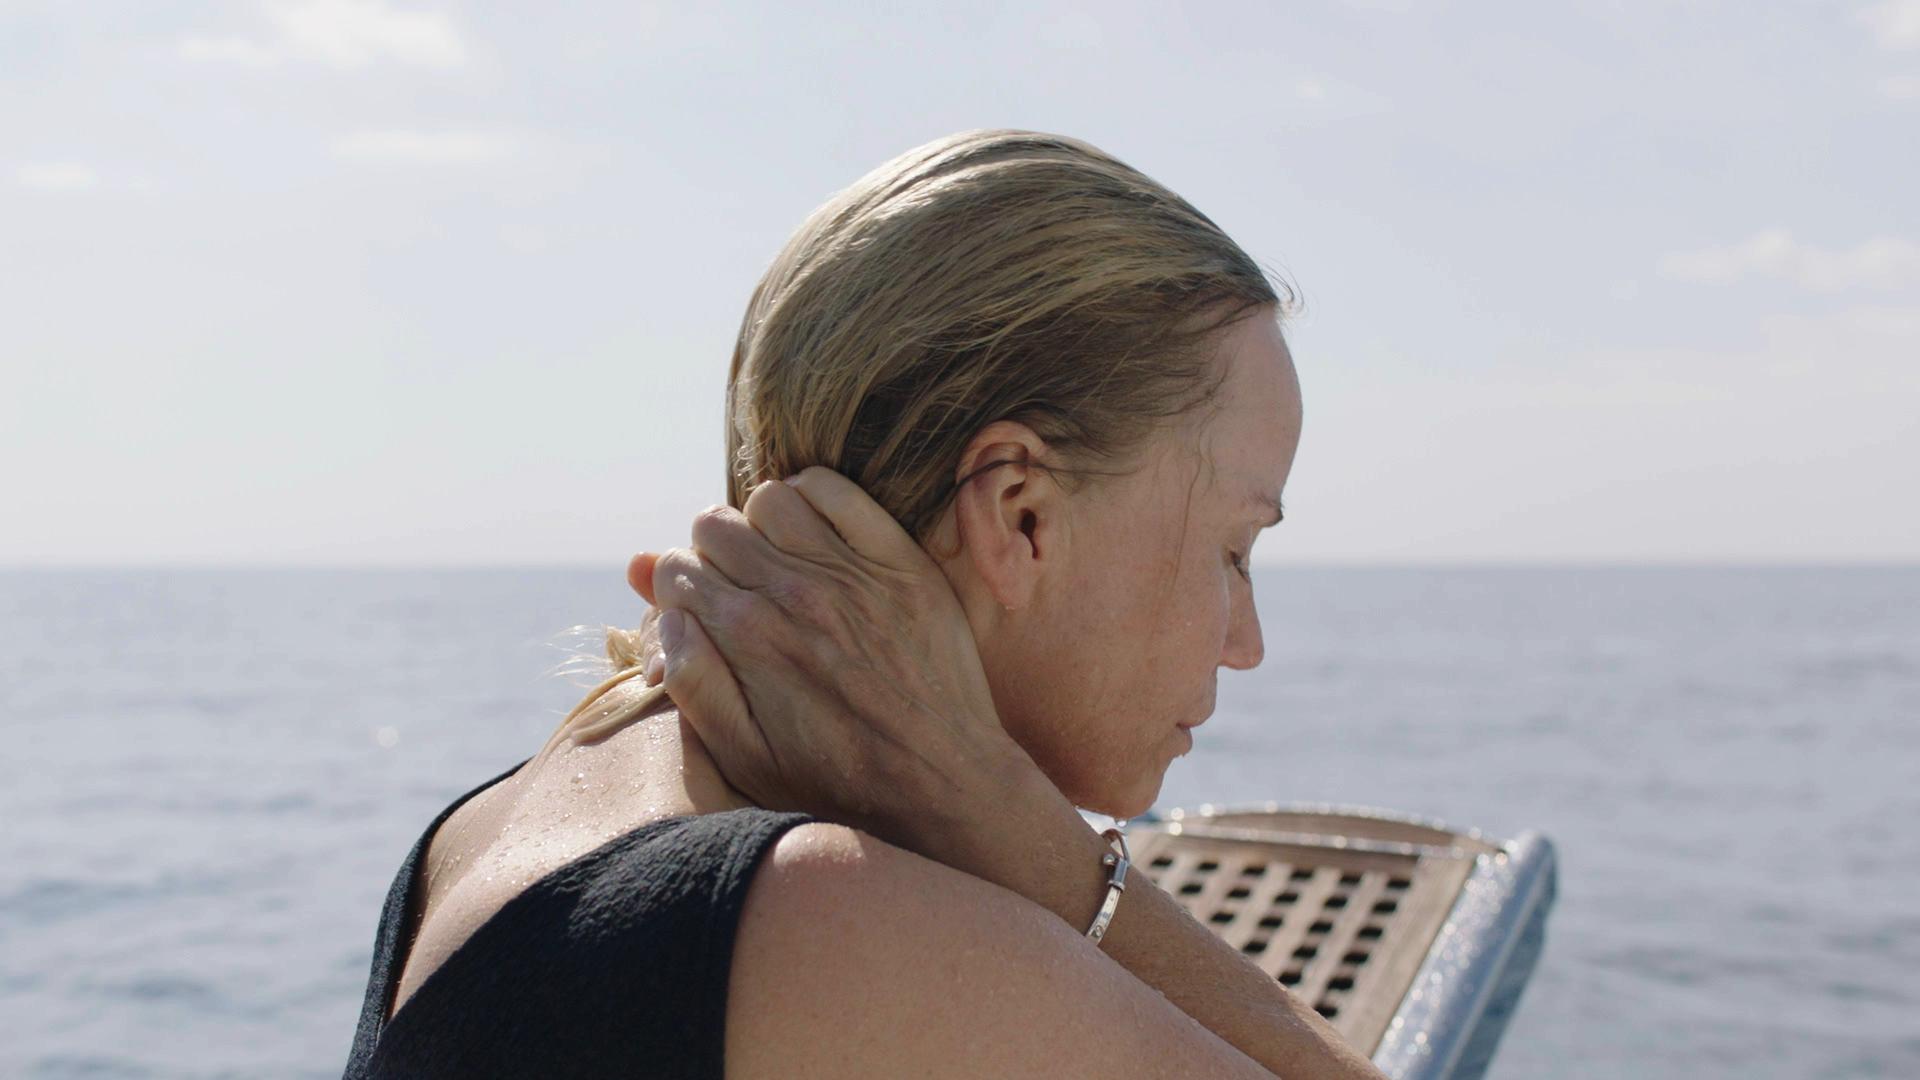 Image1 – Lifeboat